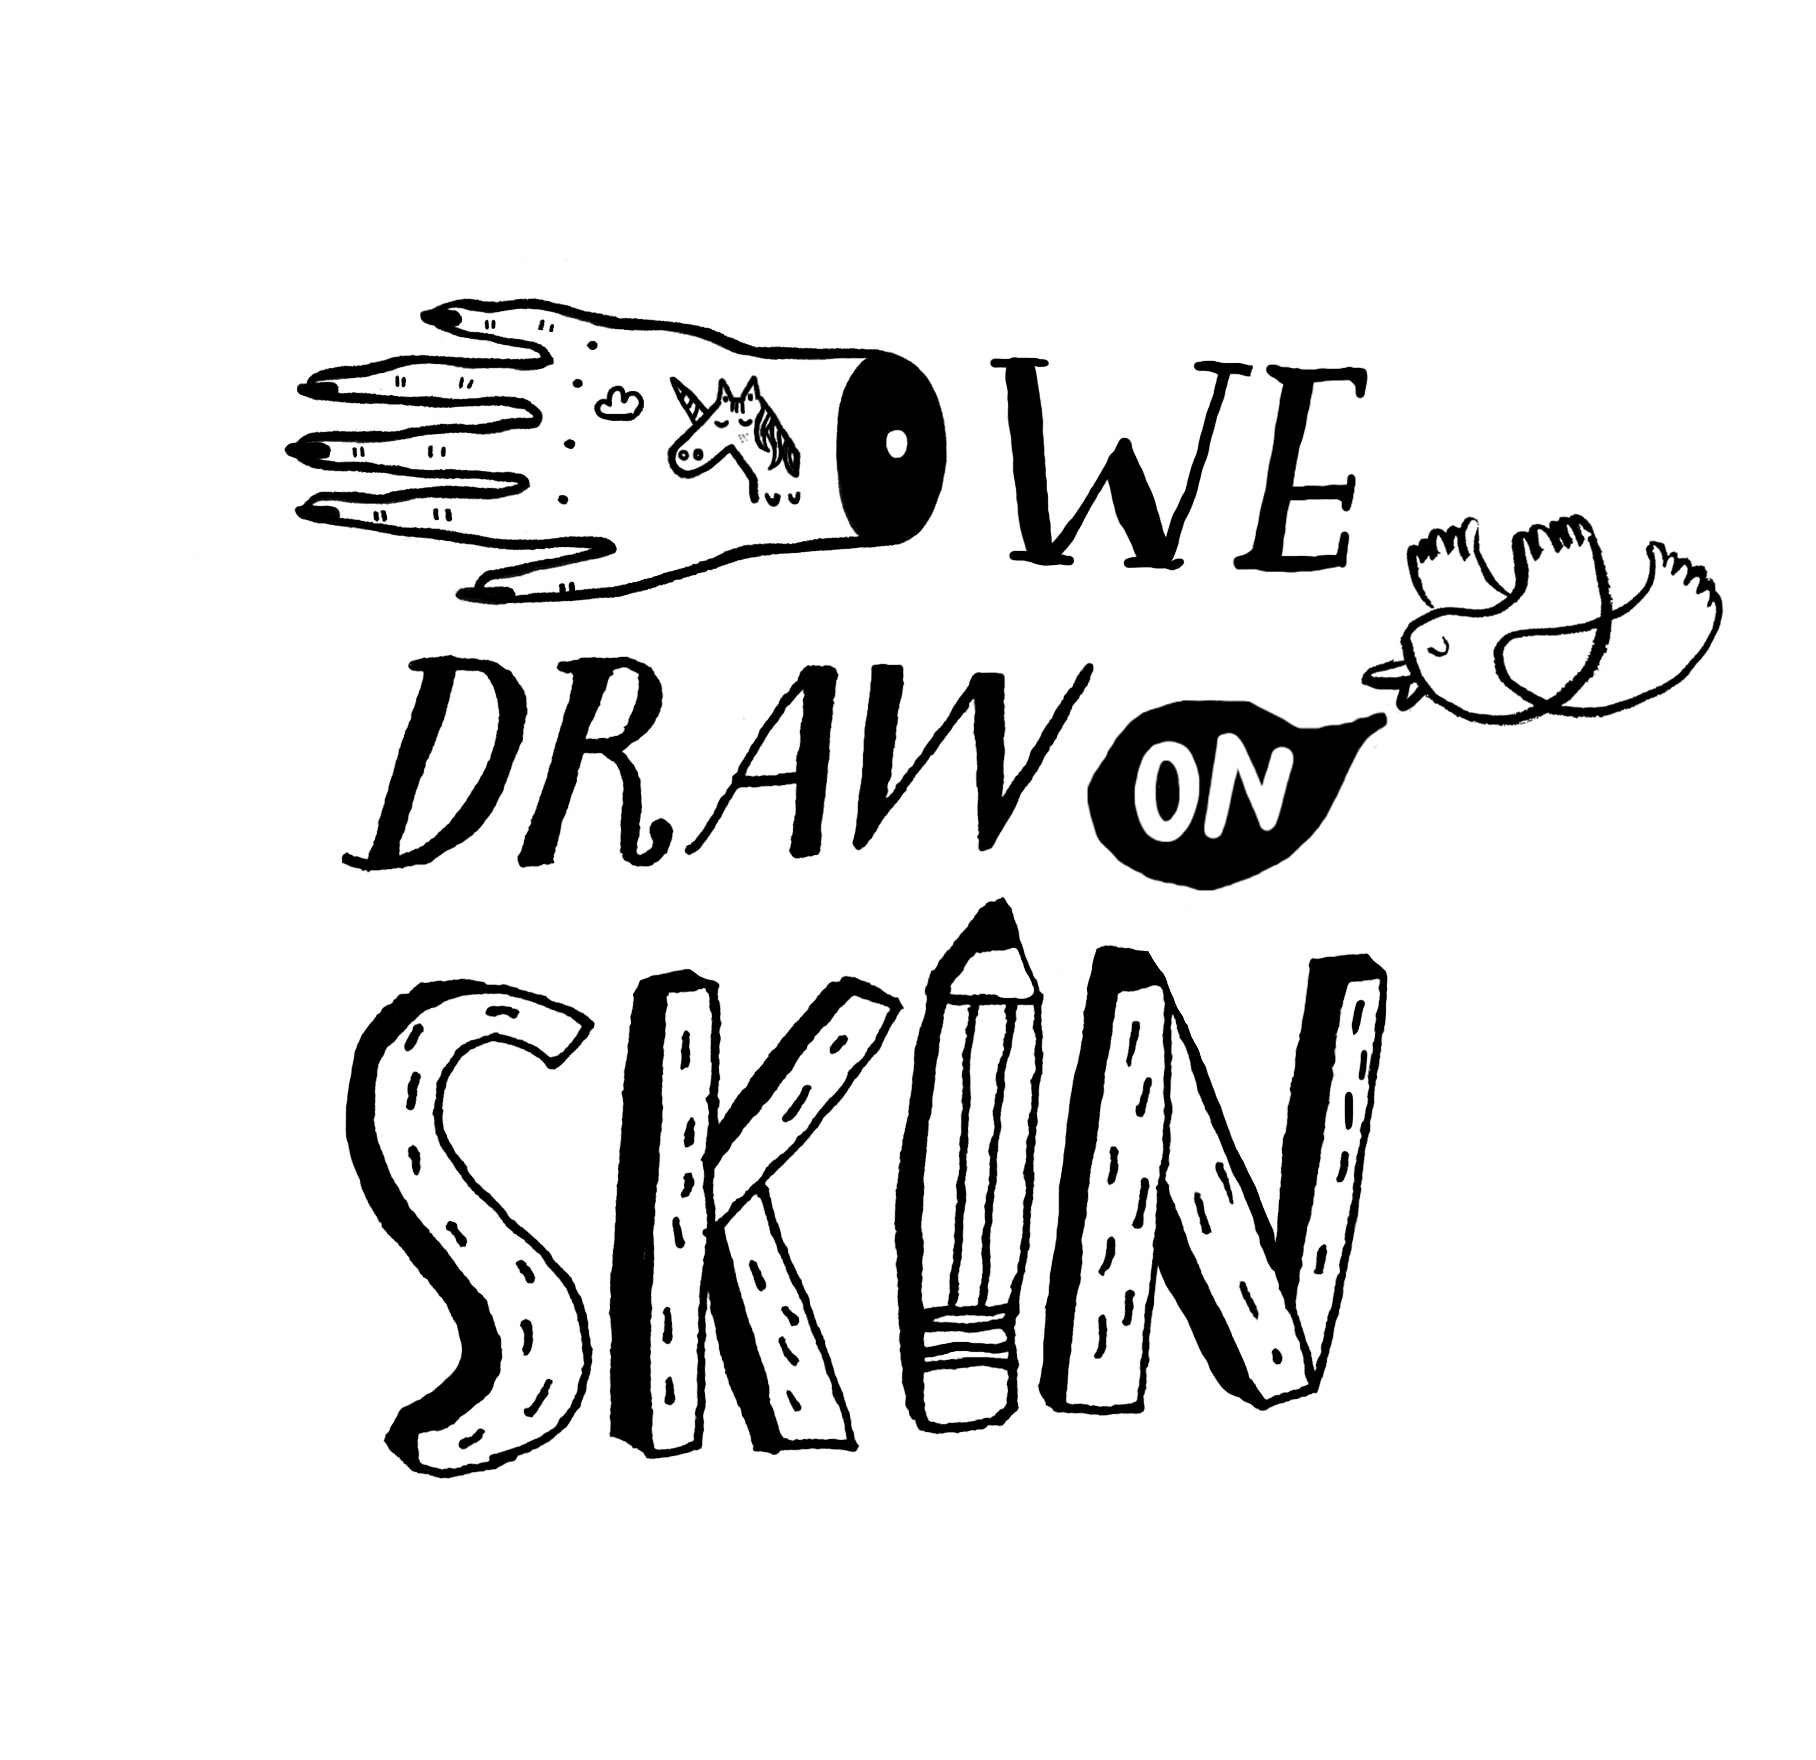 Wedrawonskin_logo.jpg